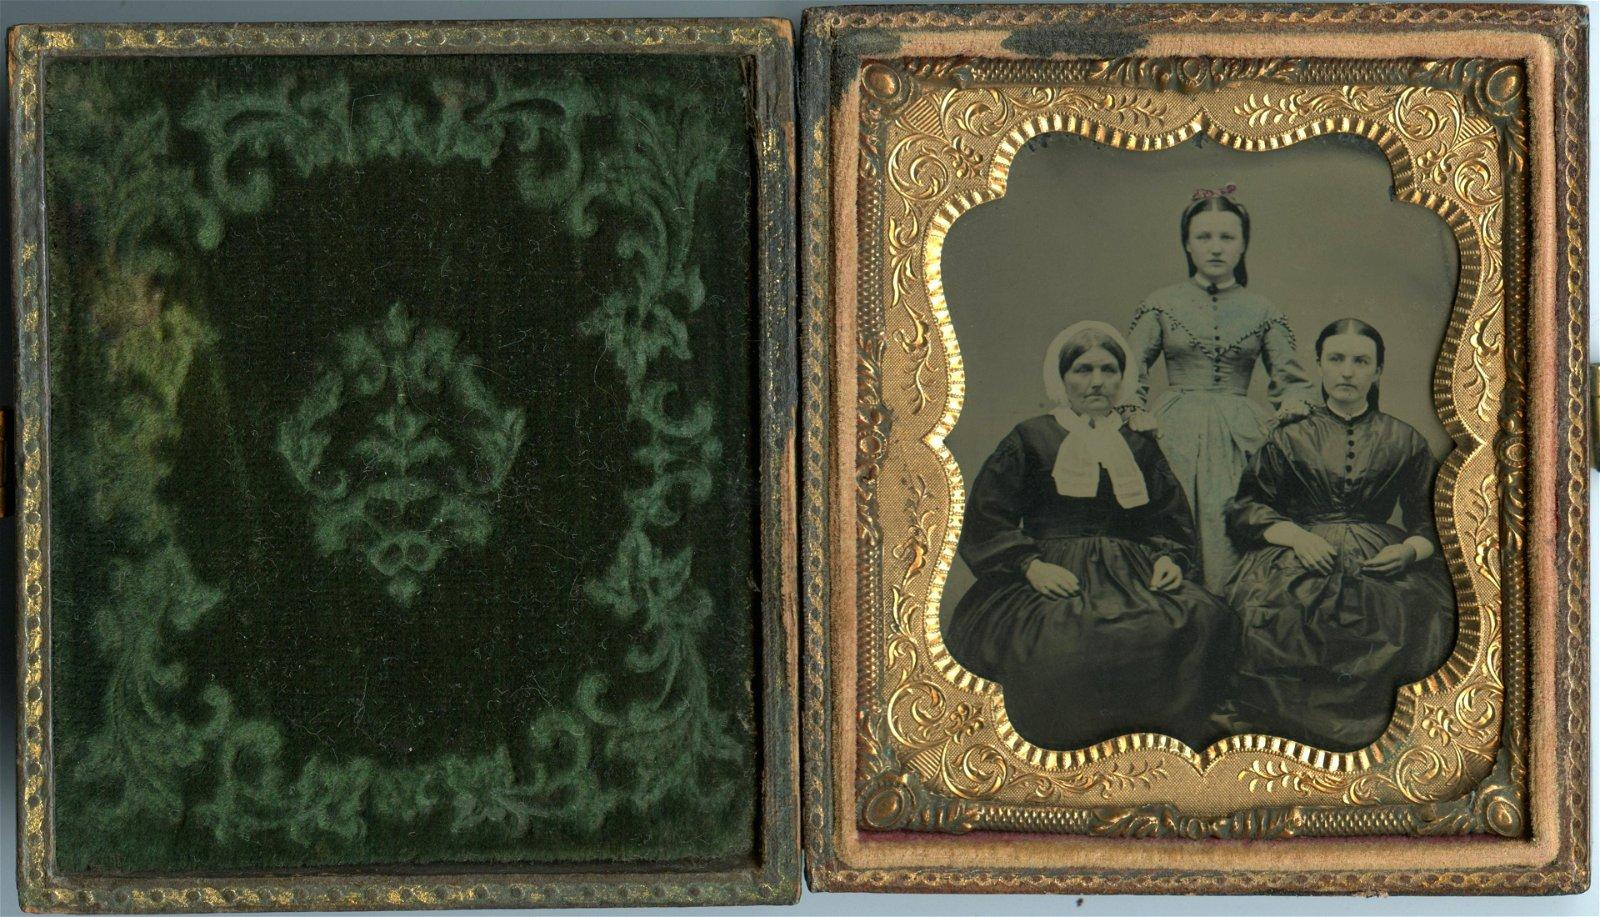 Sixth Plate Tintype of Three Women